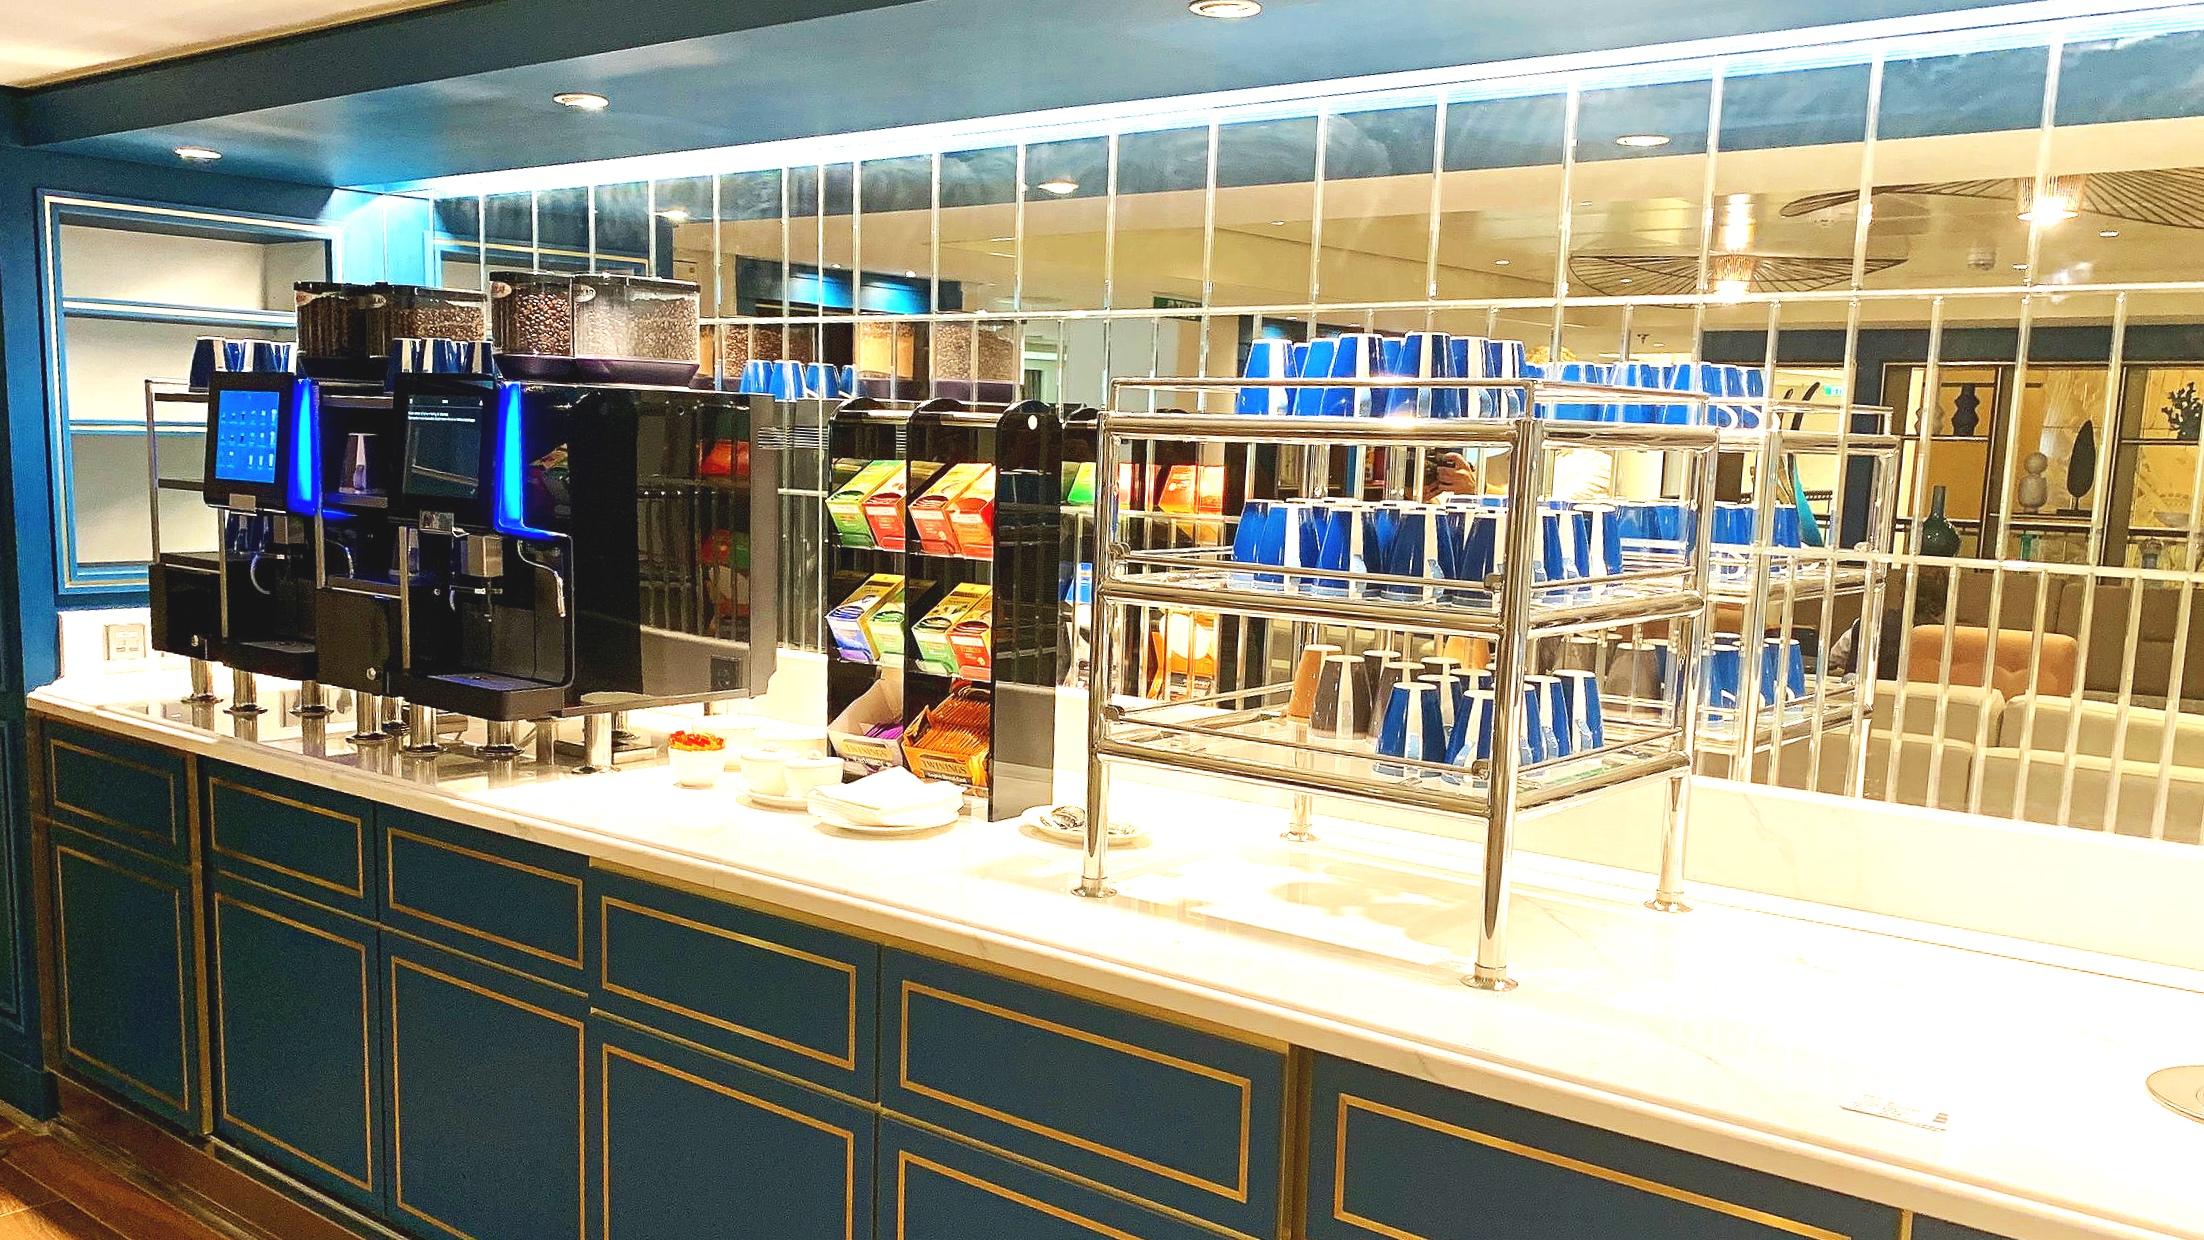 Self service tea/coffee station